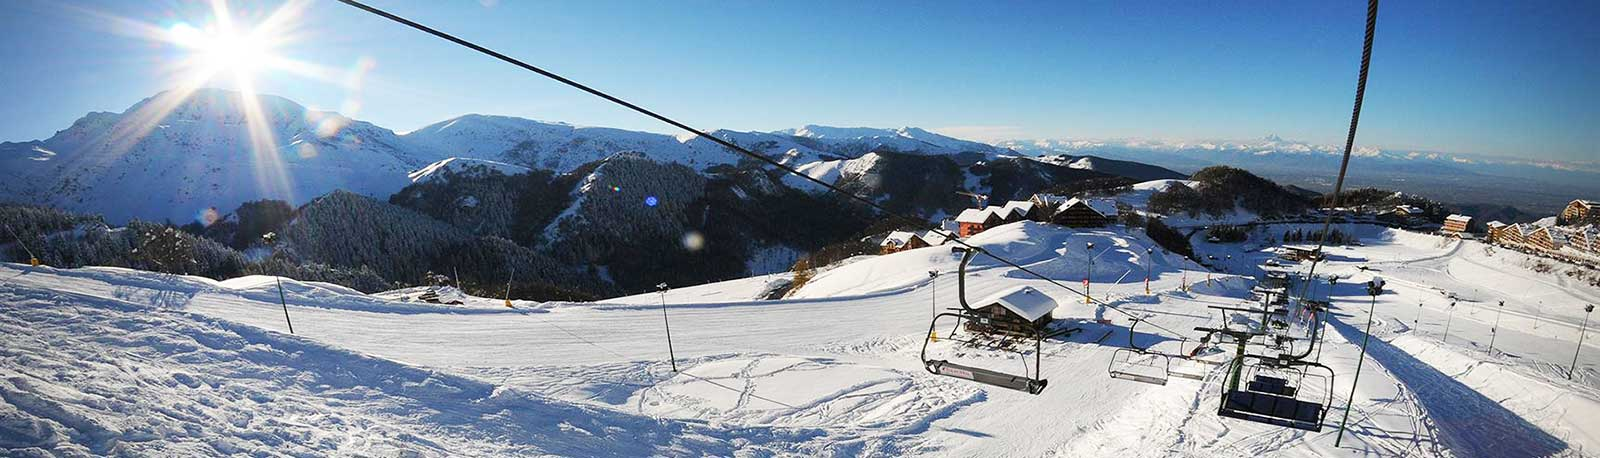 Prato Nevosa School Ski Trips